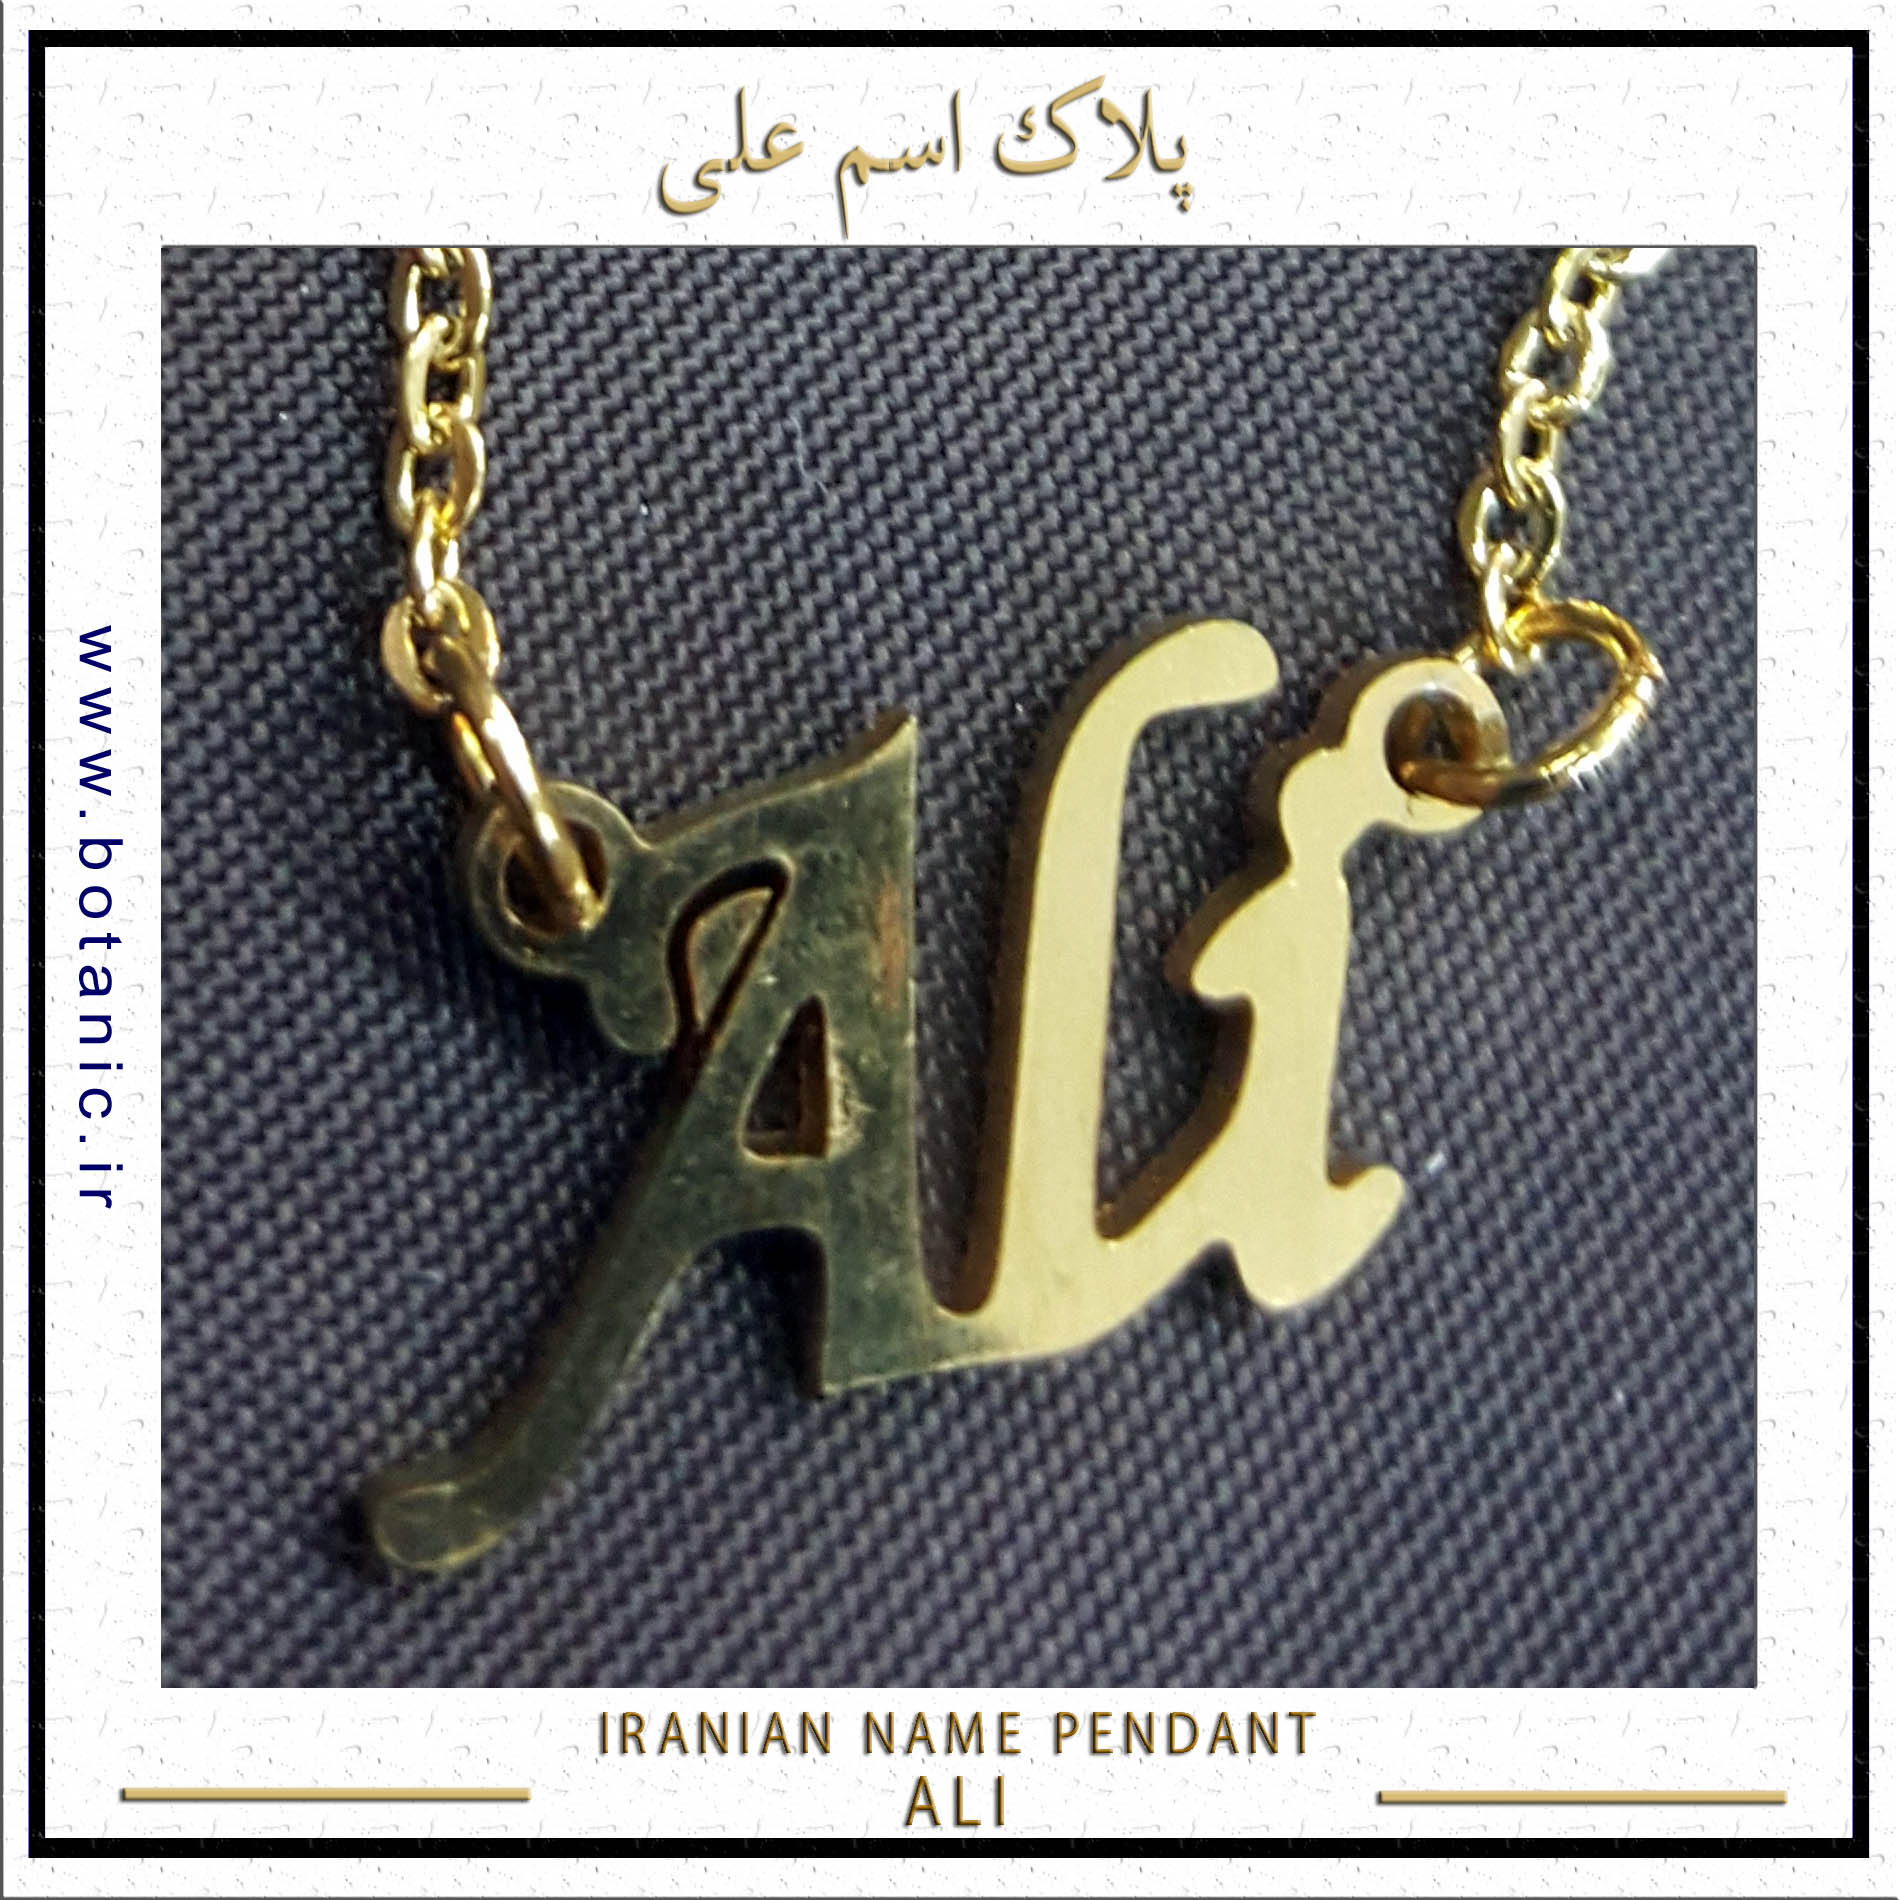 Iranian Name Pendant Ali